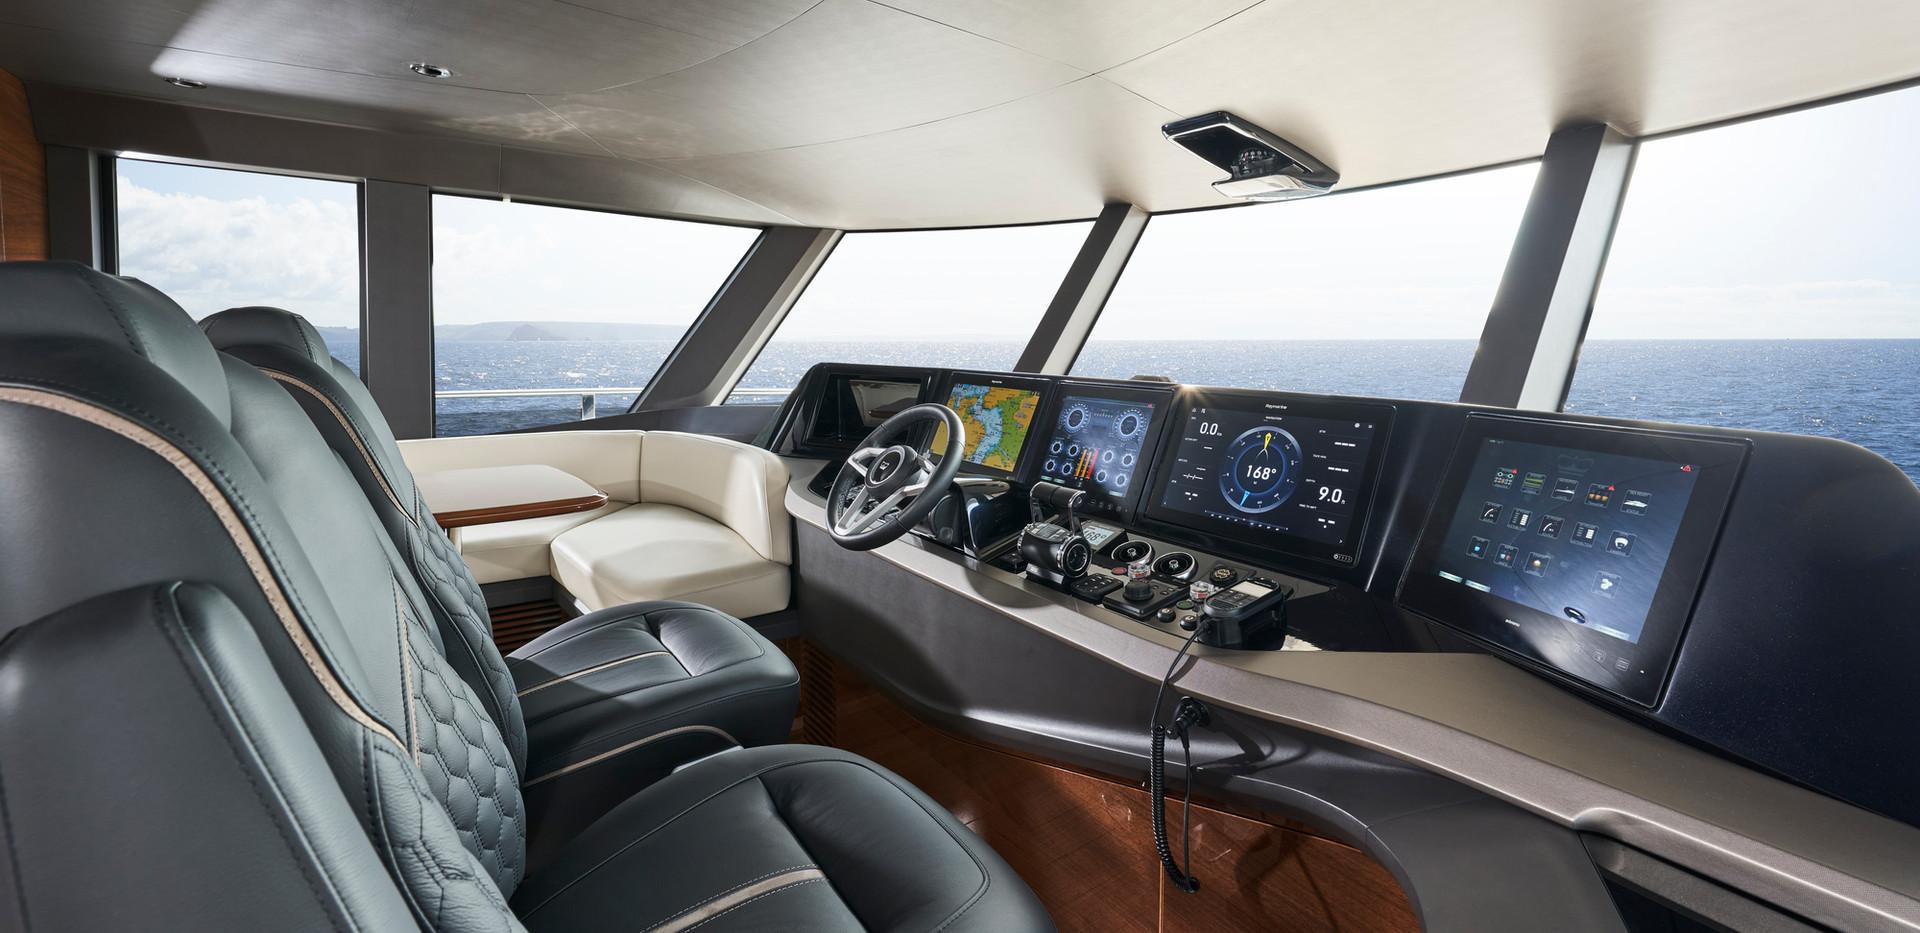 x95-slot-2-interior-wheelhouse-2.jpg